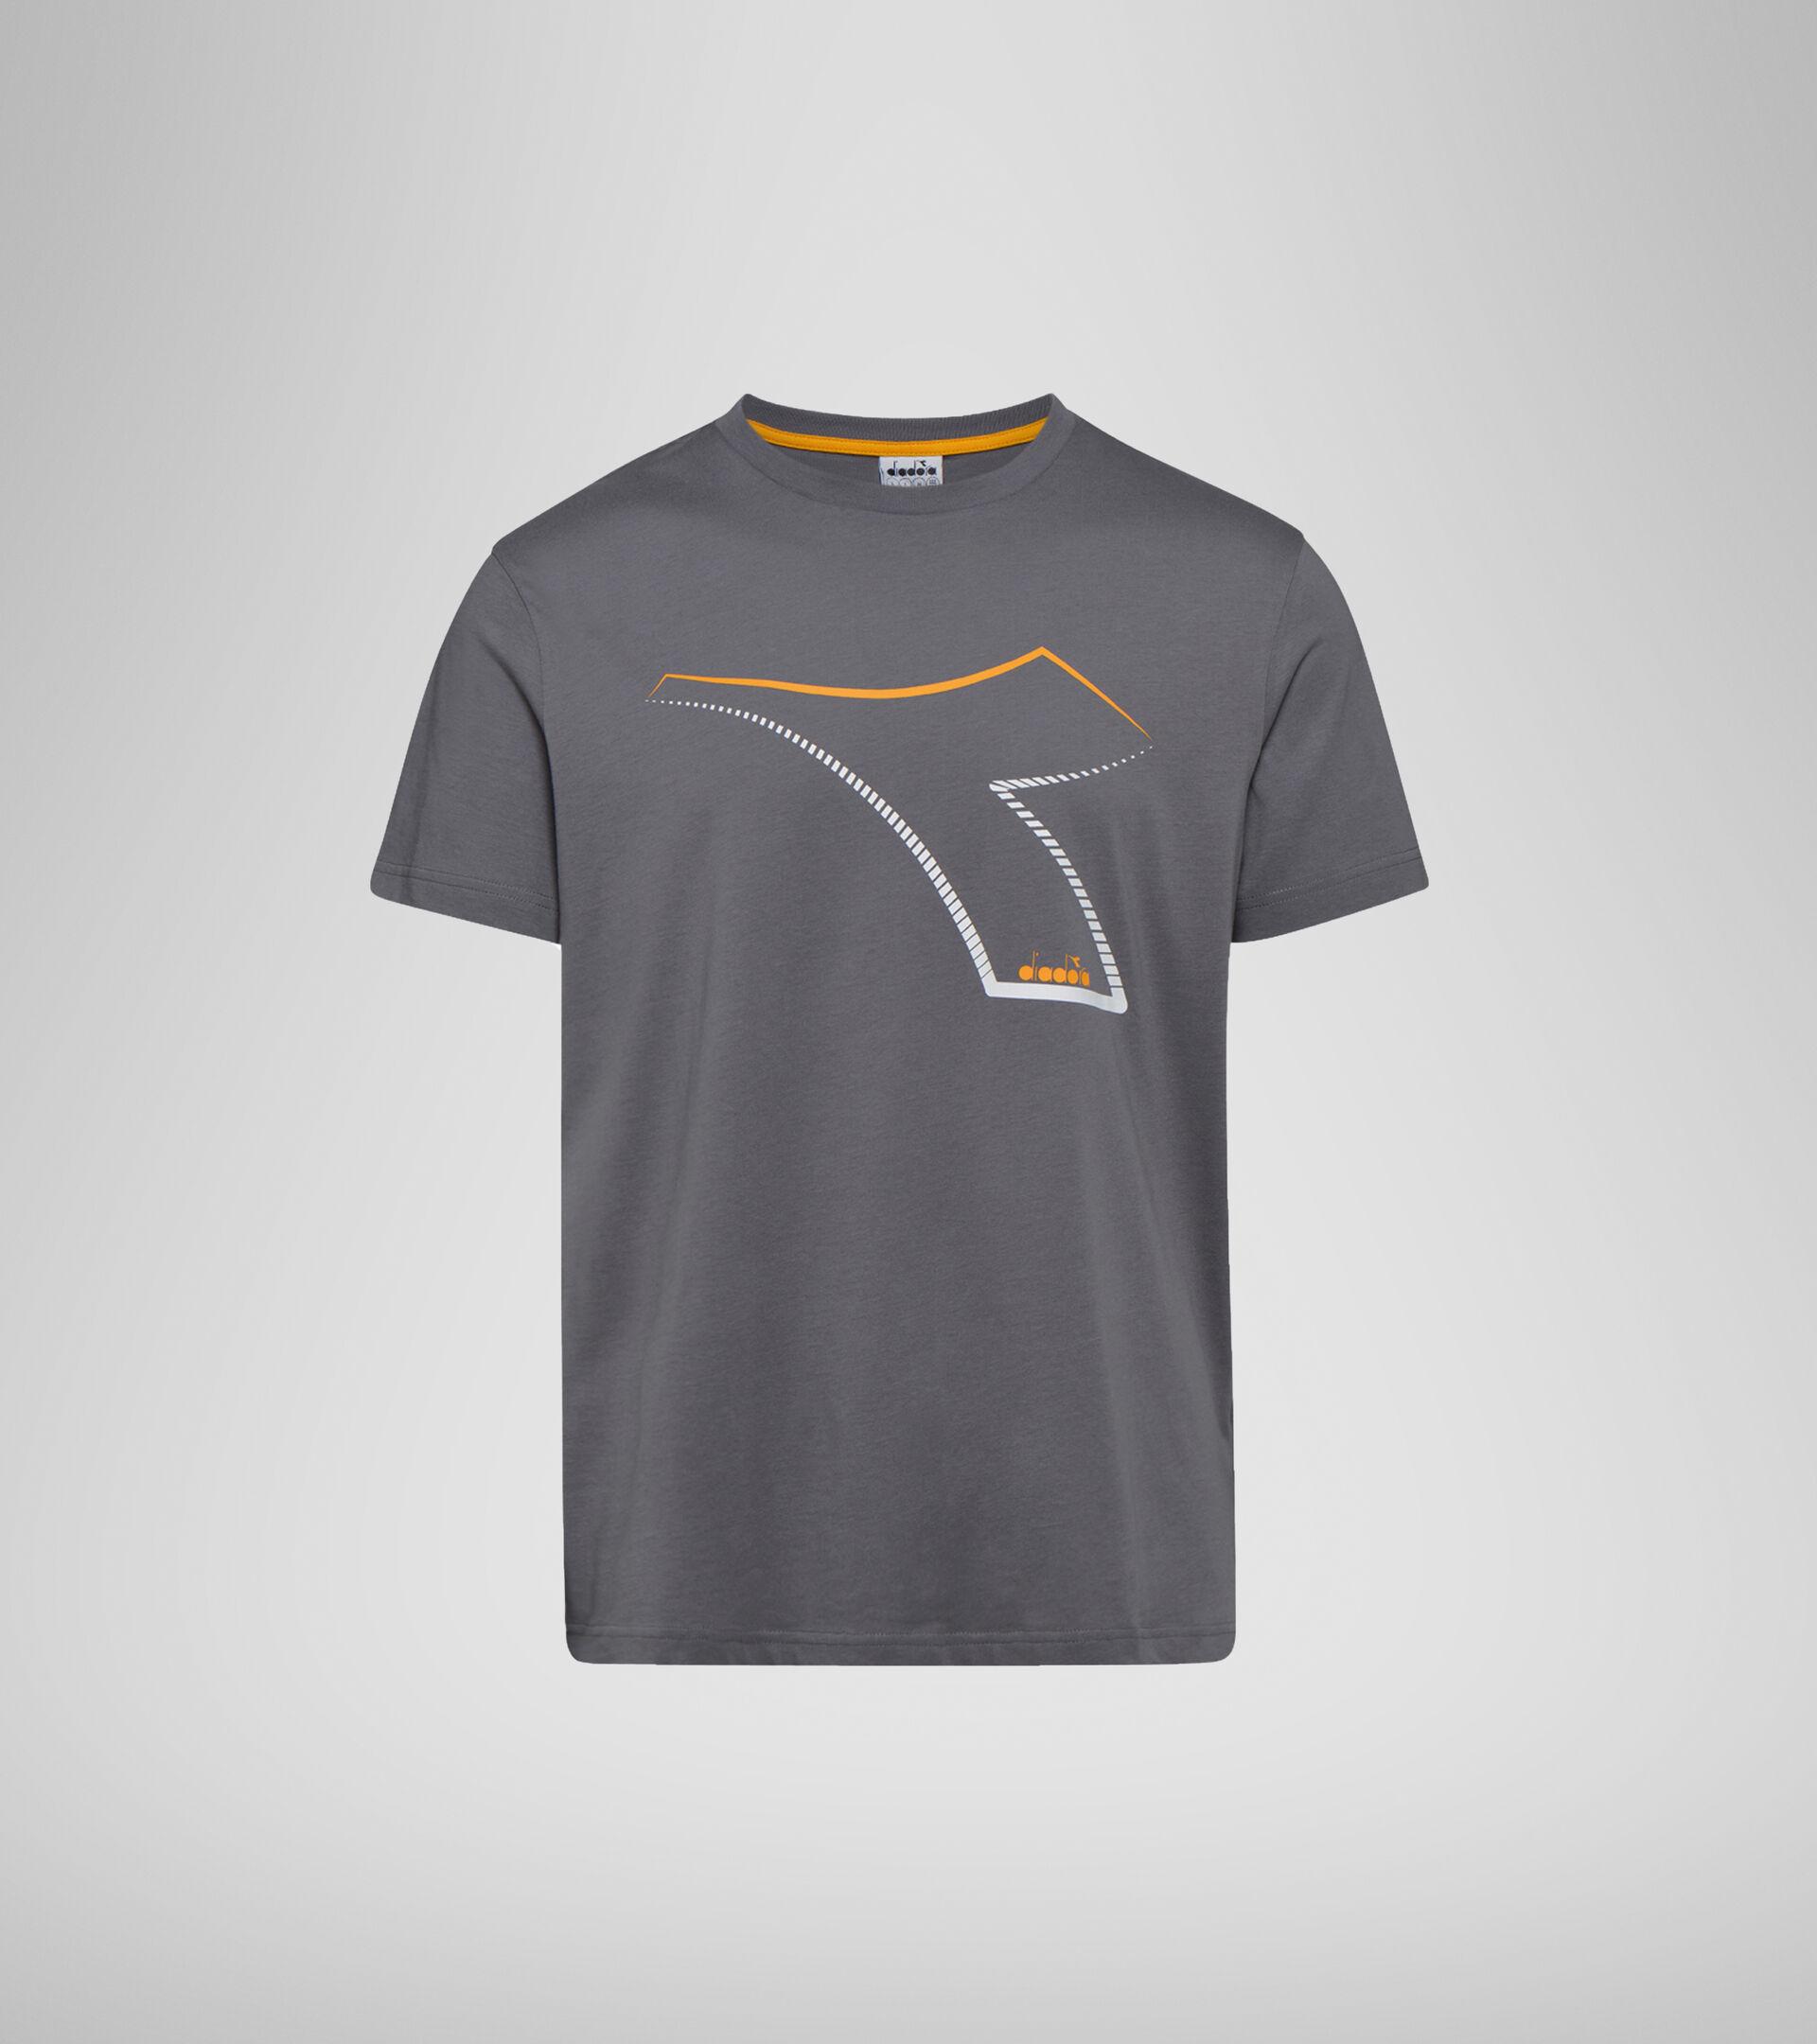 T-shirt - Men T-SHIRT SS FREGIO CLUB STORM GRAY  (75069) - Diadora